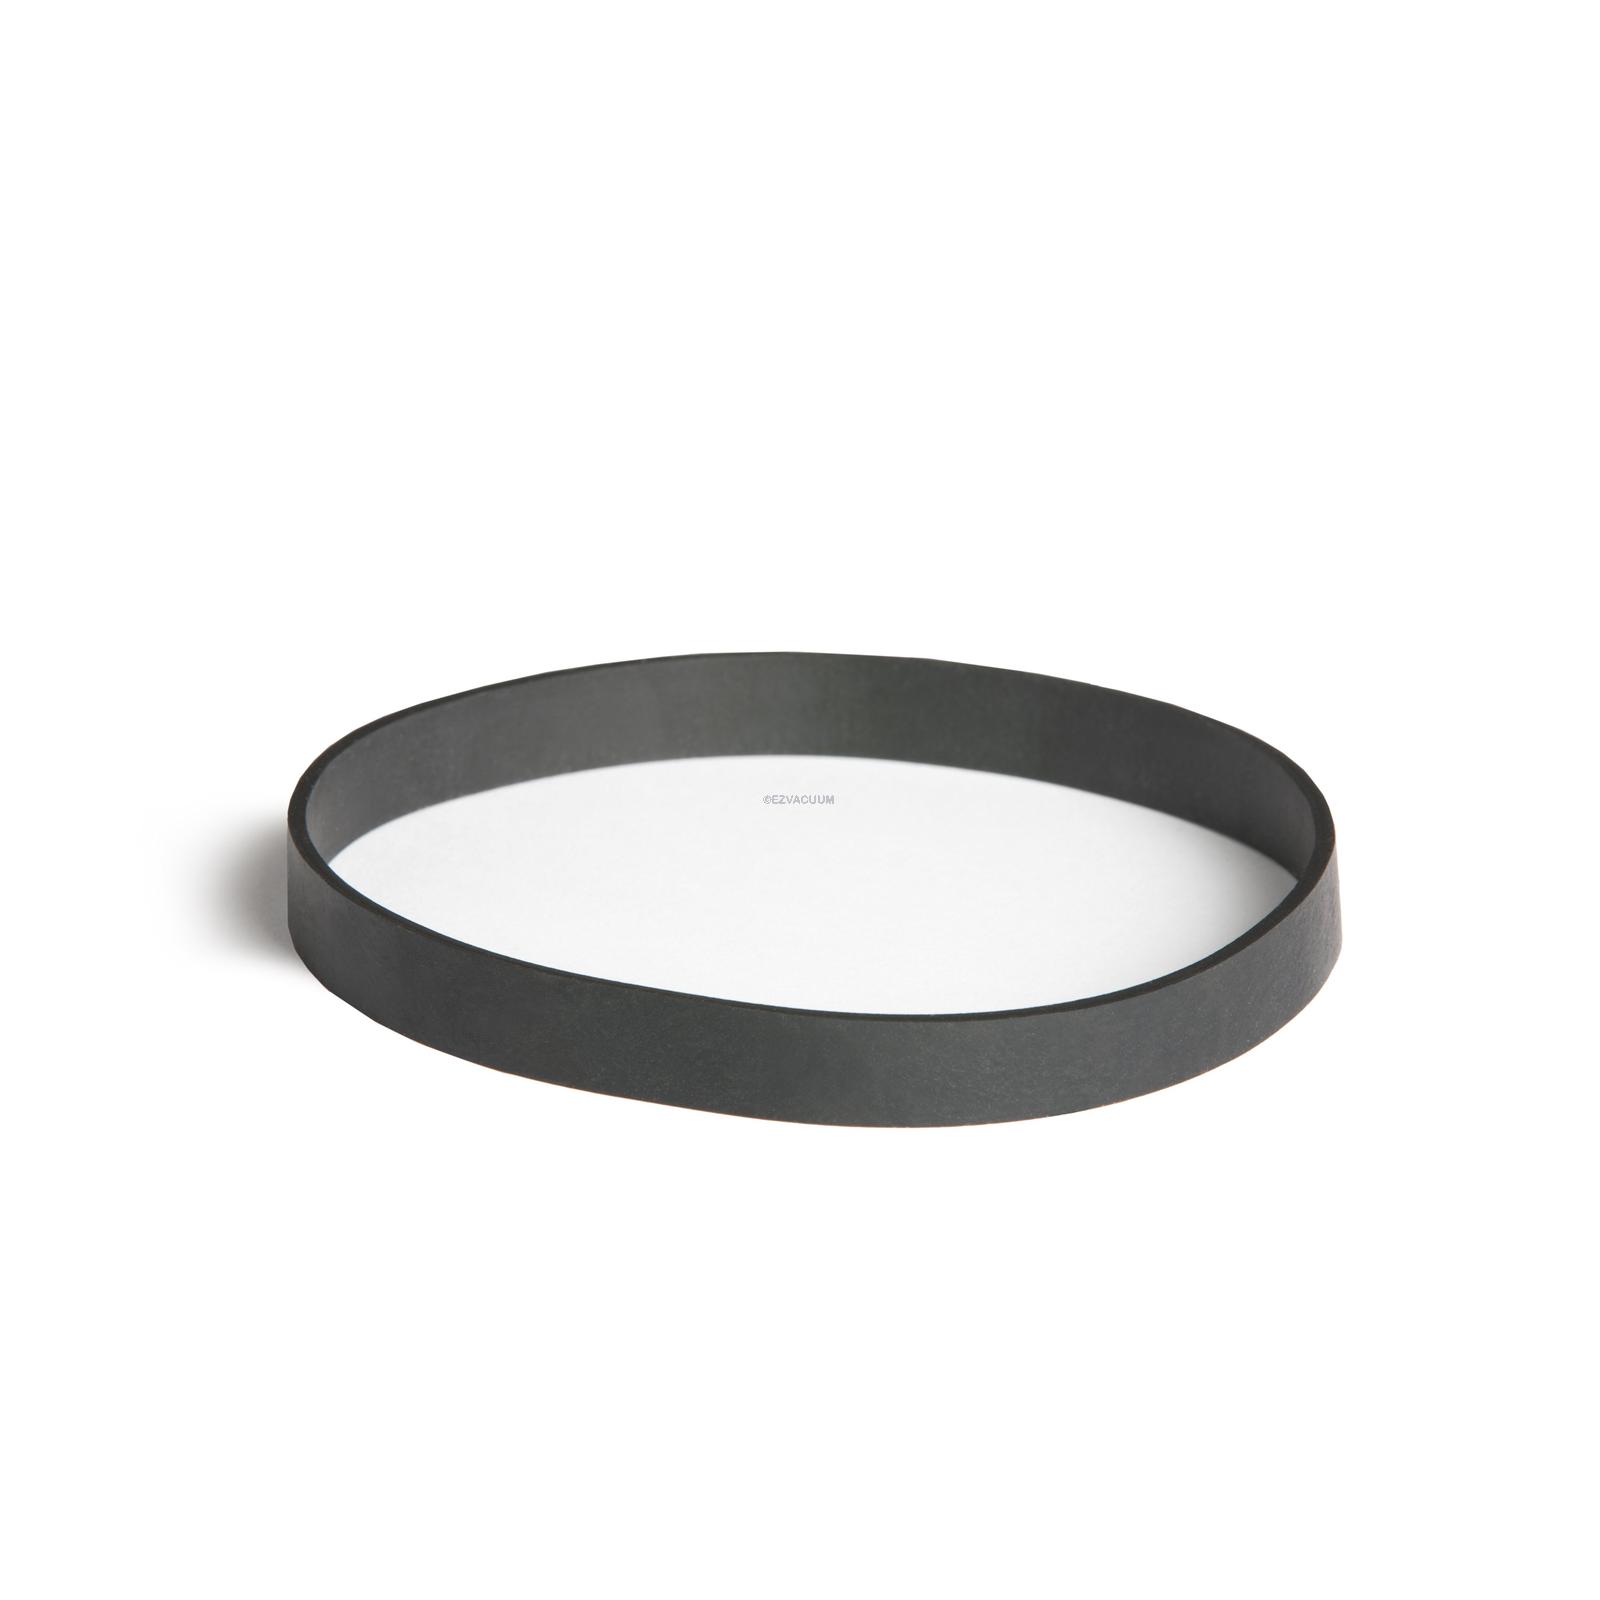 2 Belts Hoover PowerDash Pet Carpet Cleaner Replaces genuine Belt # 440014074